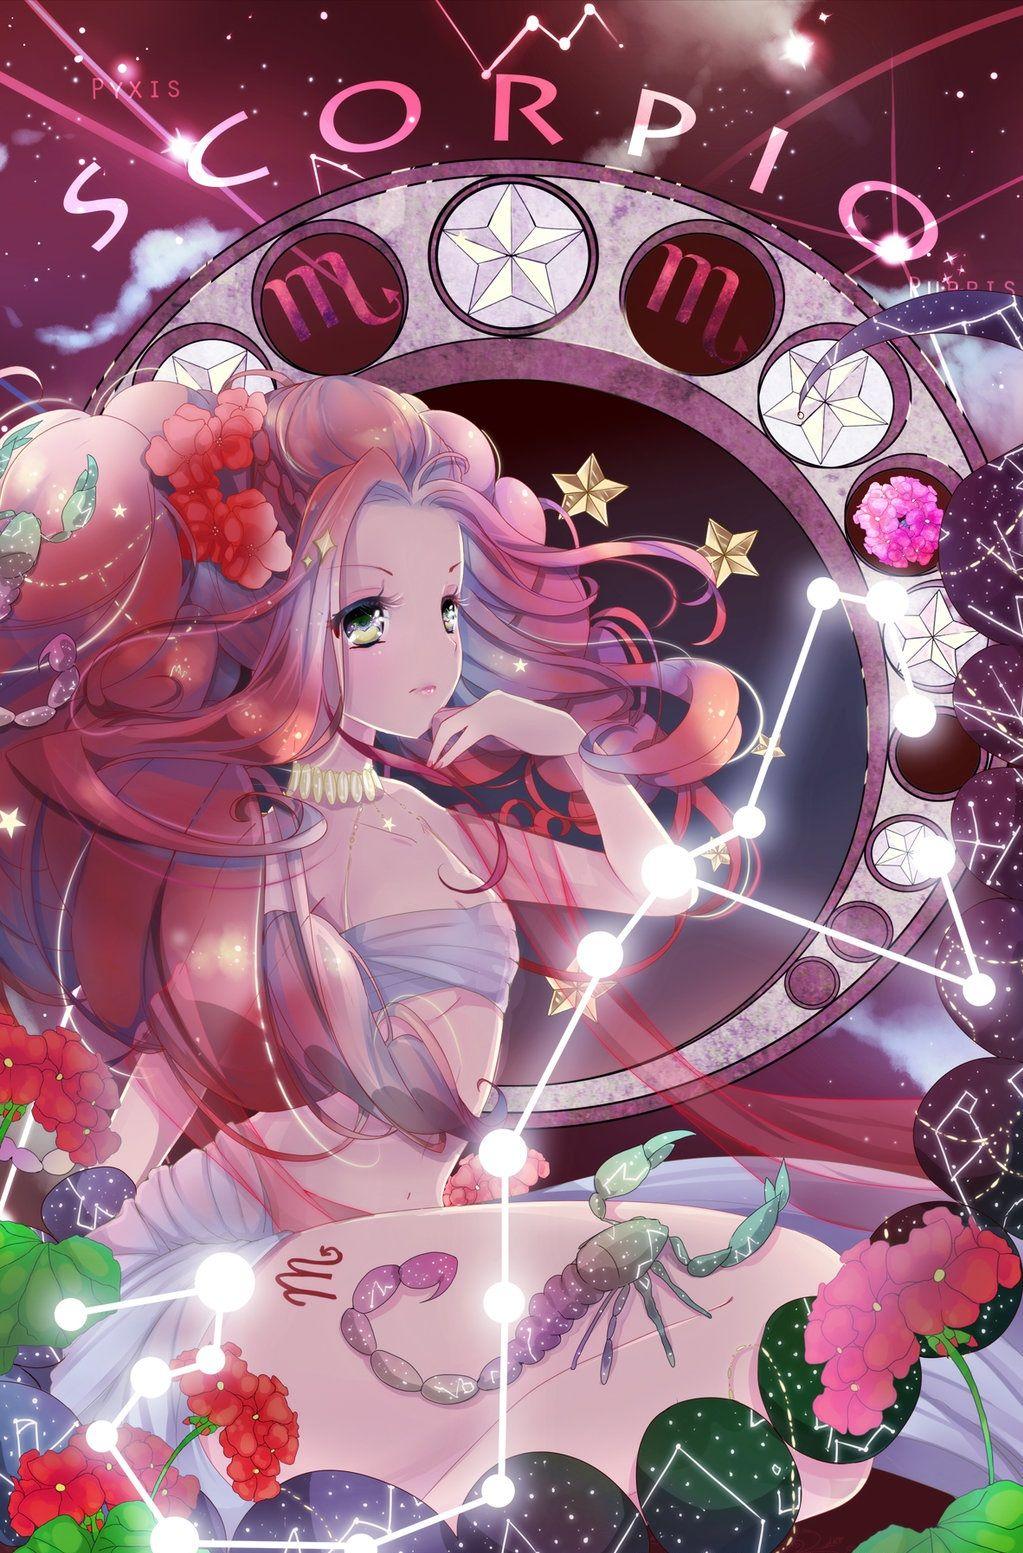 Scorpio Deep And Mysterious Anime Zodiac Constellation Art Zodiac Art